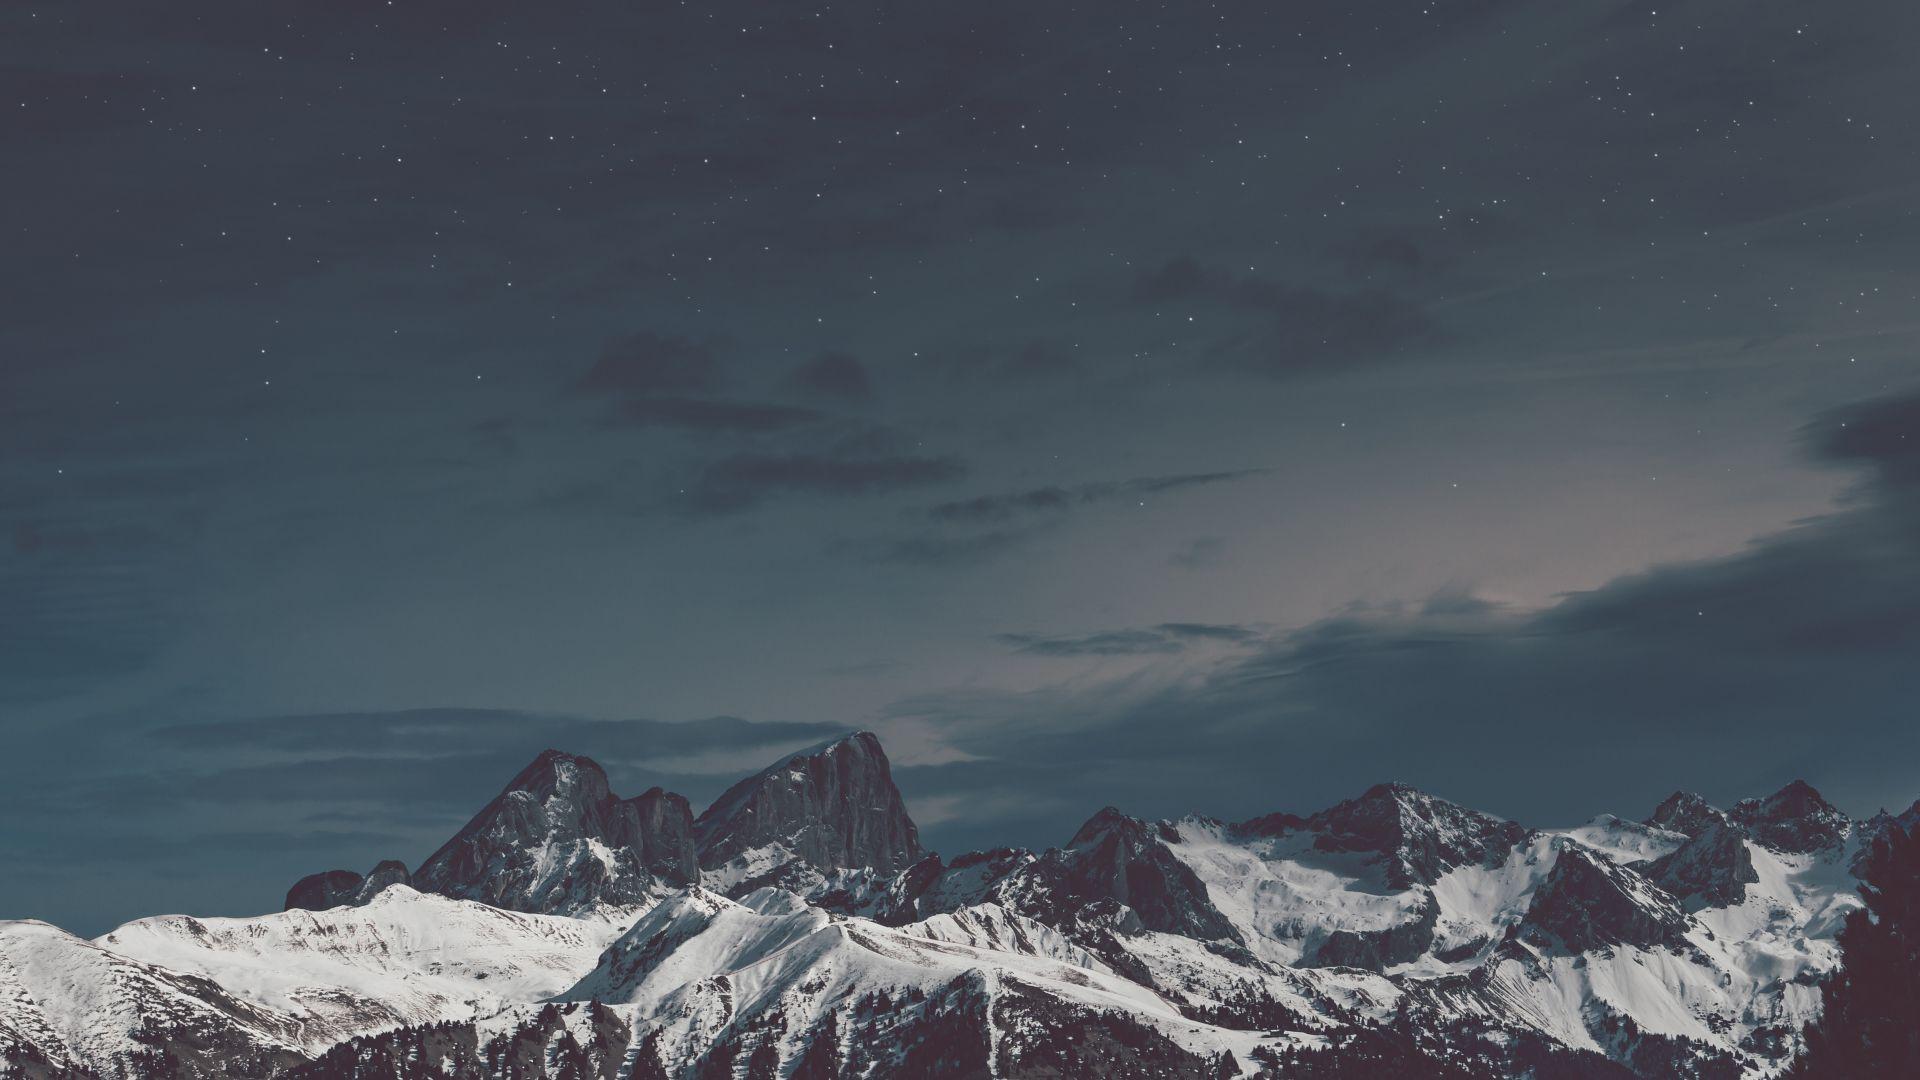 Wallpaper Snow mountains, night, starry sky, 4k